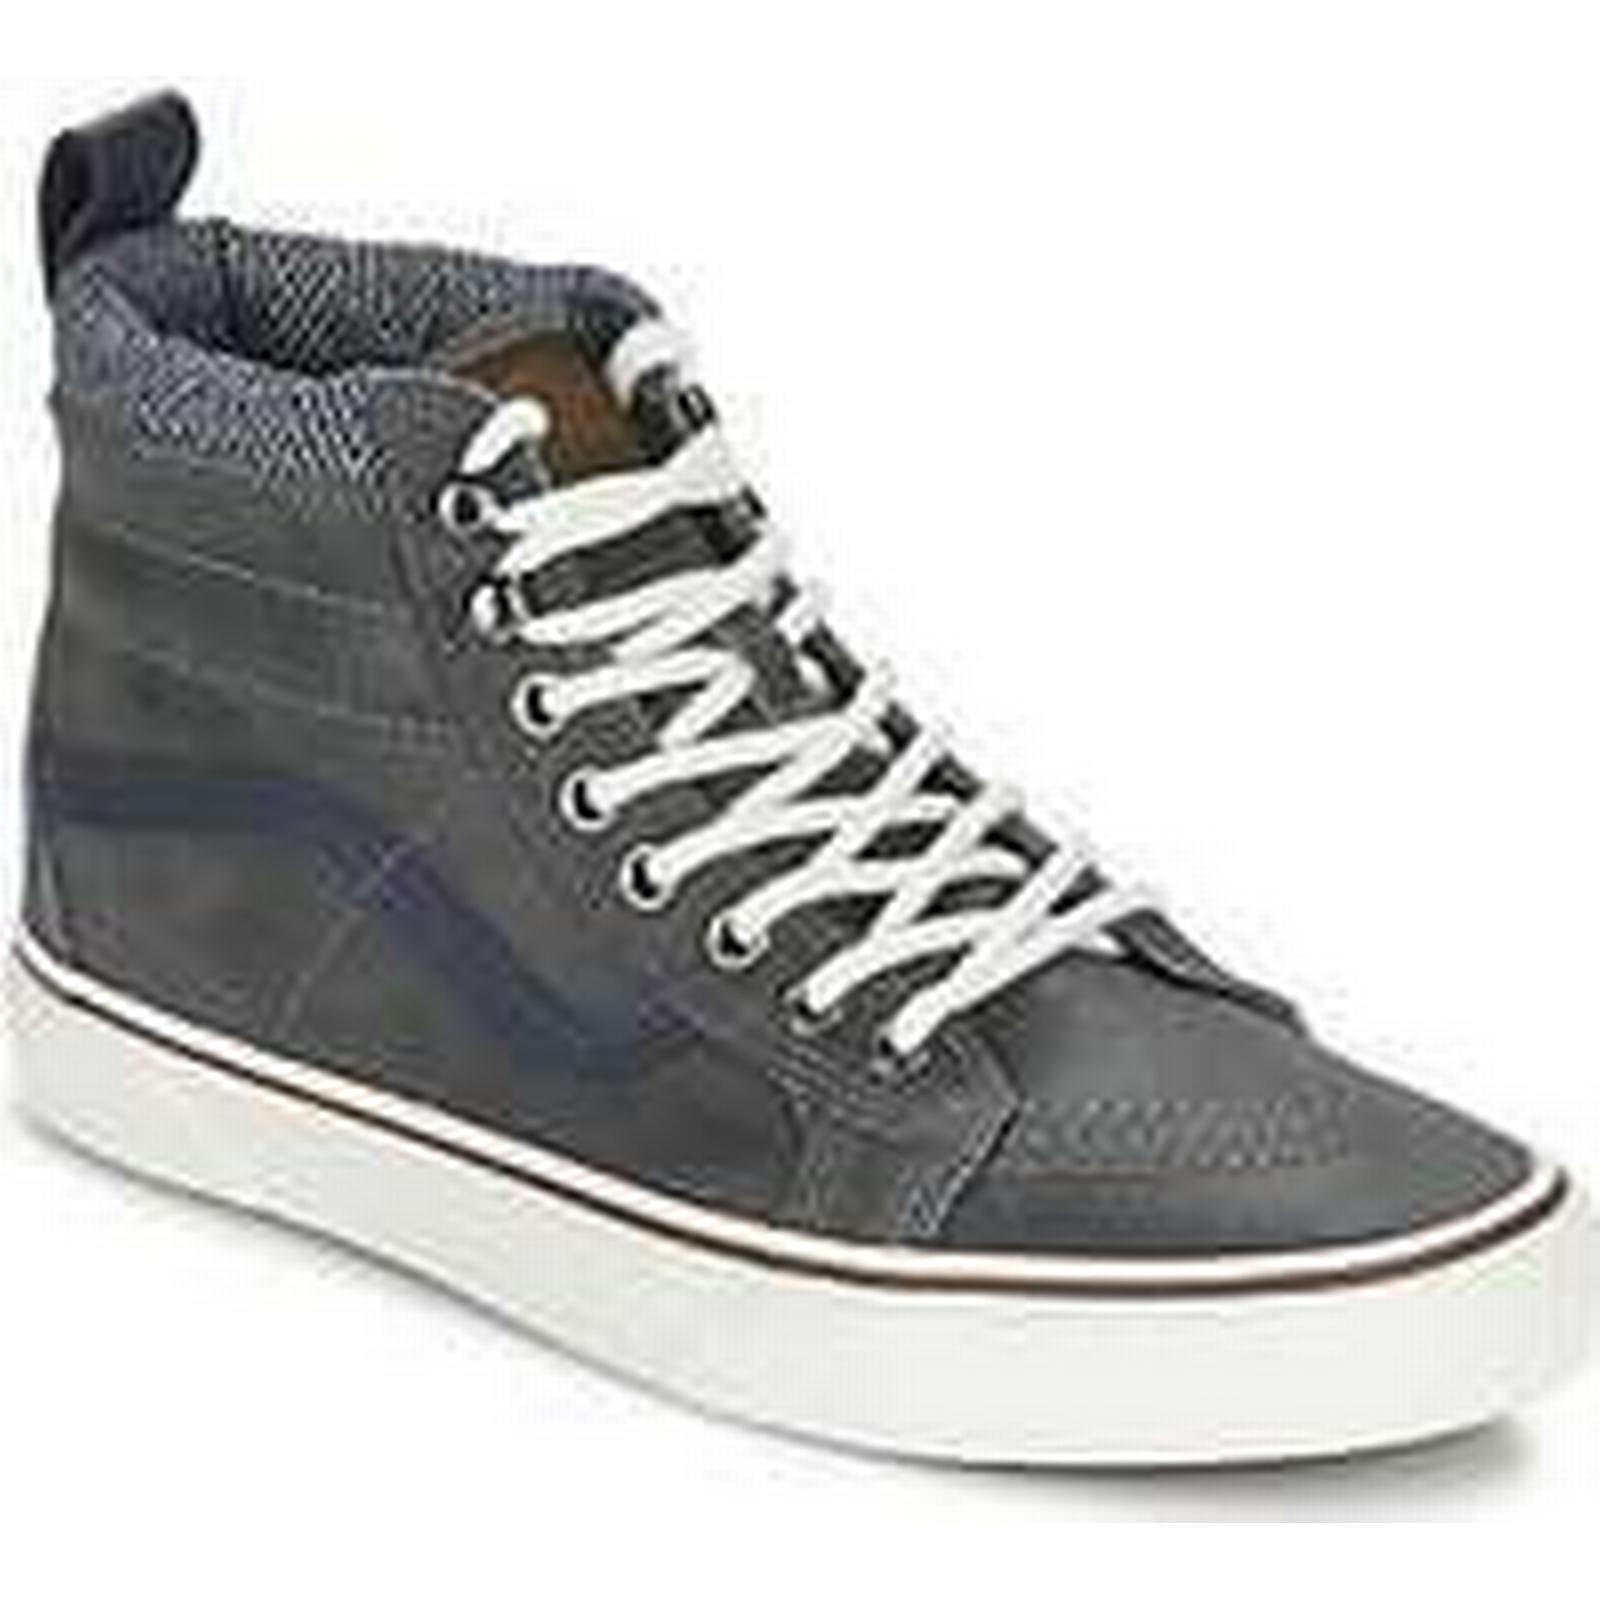 Spartoo.co.uk Vans SK8-Hi Trainers) MTE women's Shoes (High-top Trainers) SK8-Hi in Grey 4d5a96